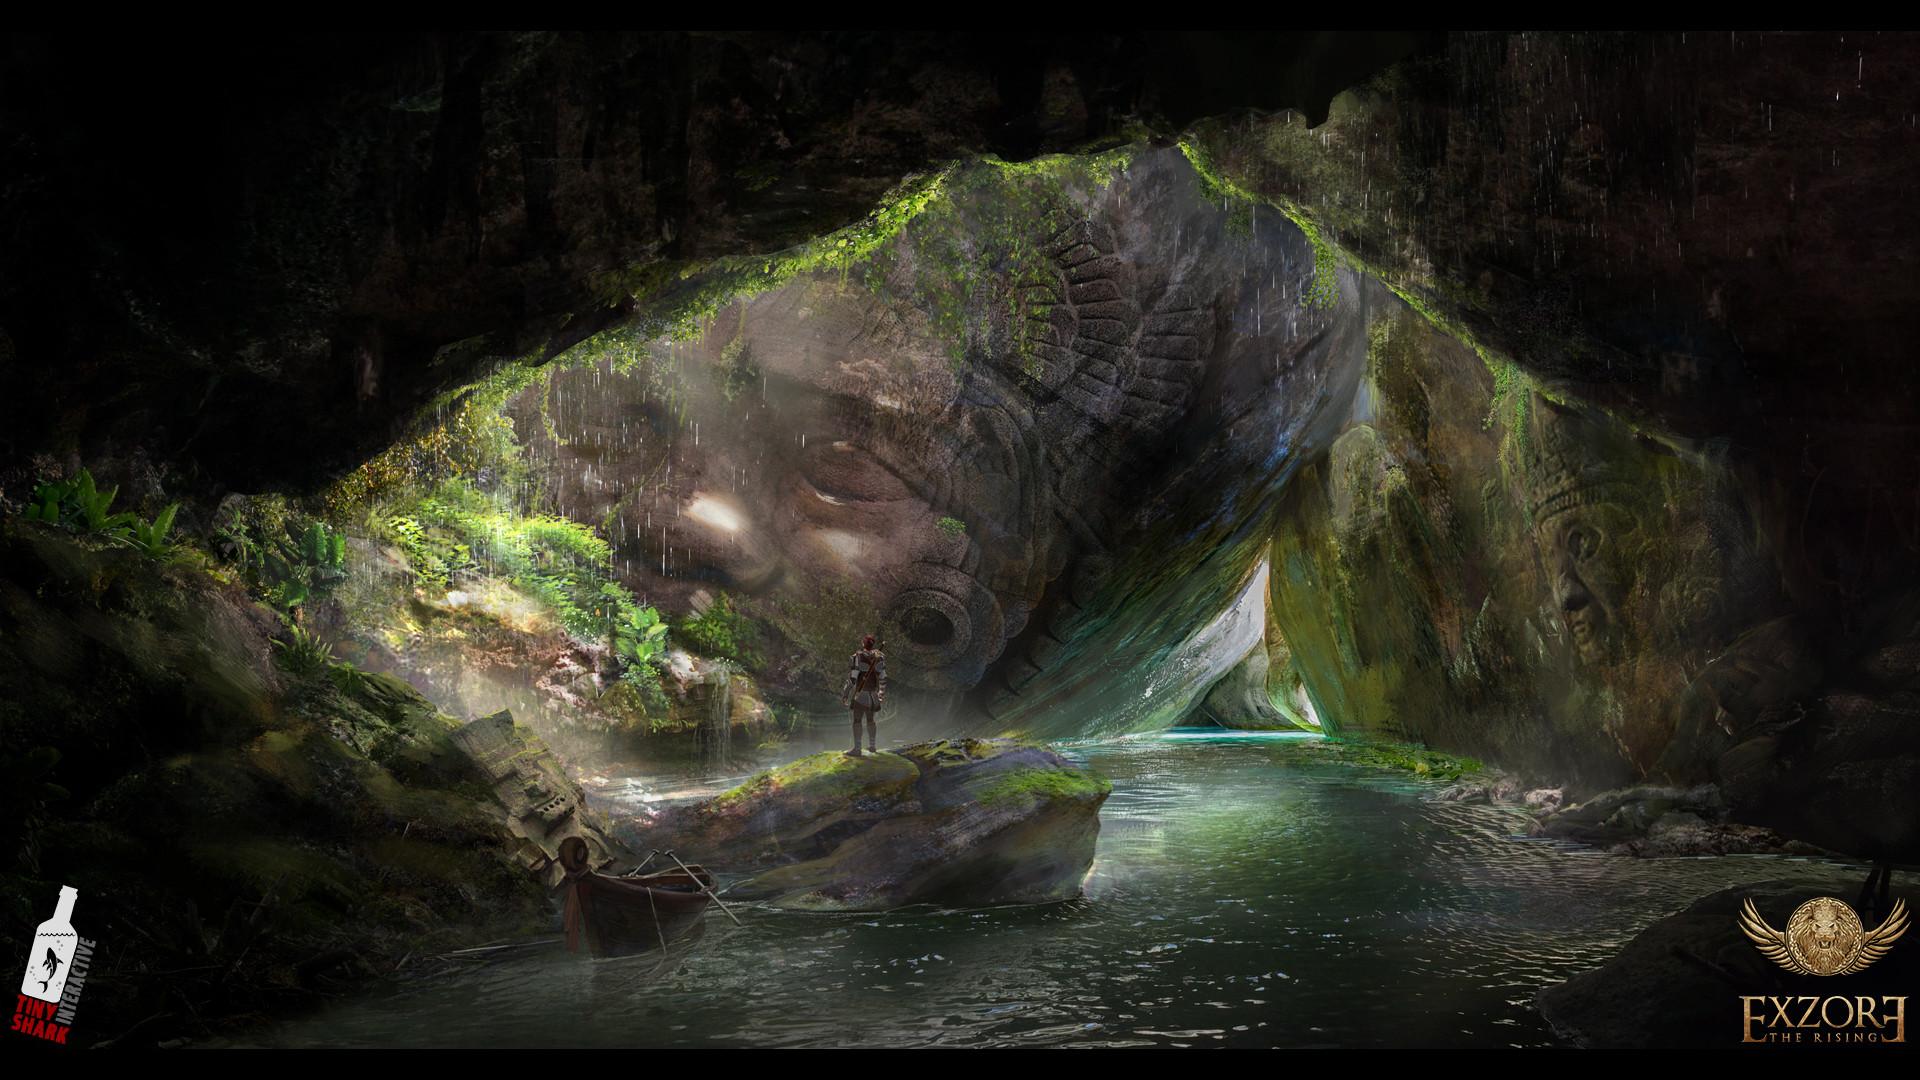 Пещера - Exzore: The Rising Арт